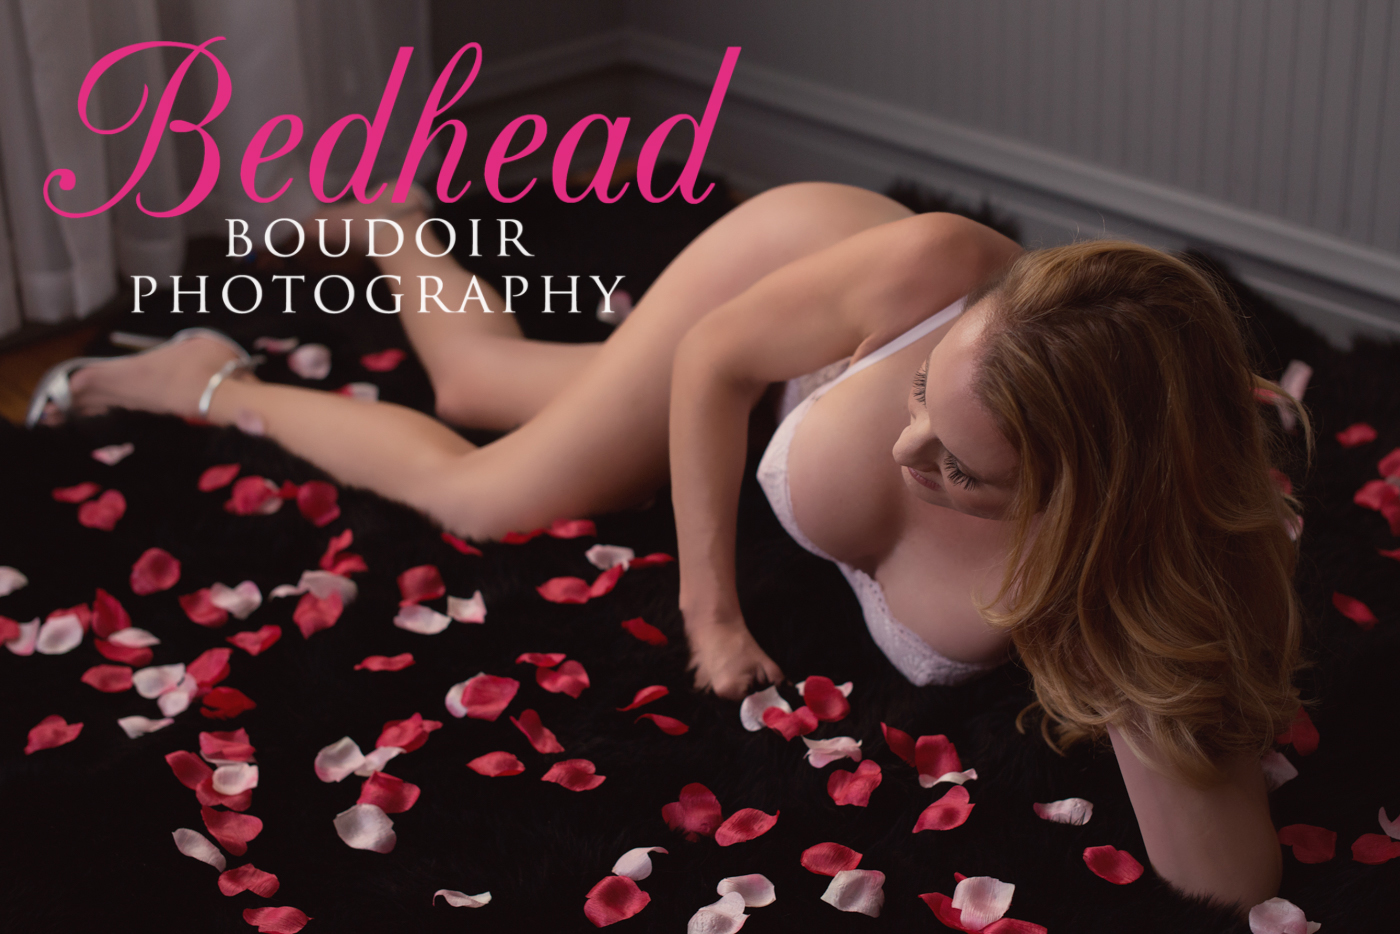 Bedhead_Boudoir_Photography_Chicago-22.jpg